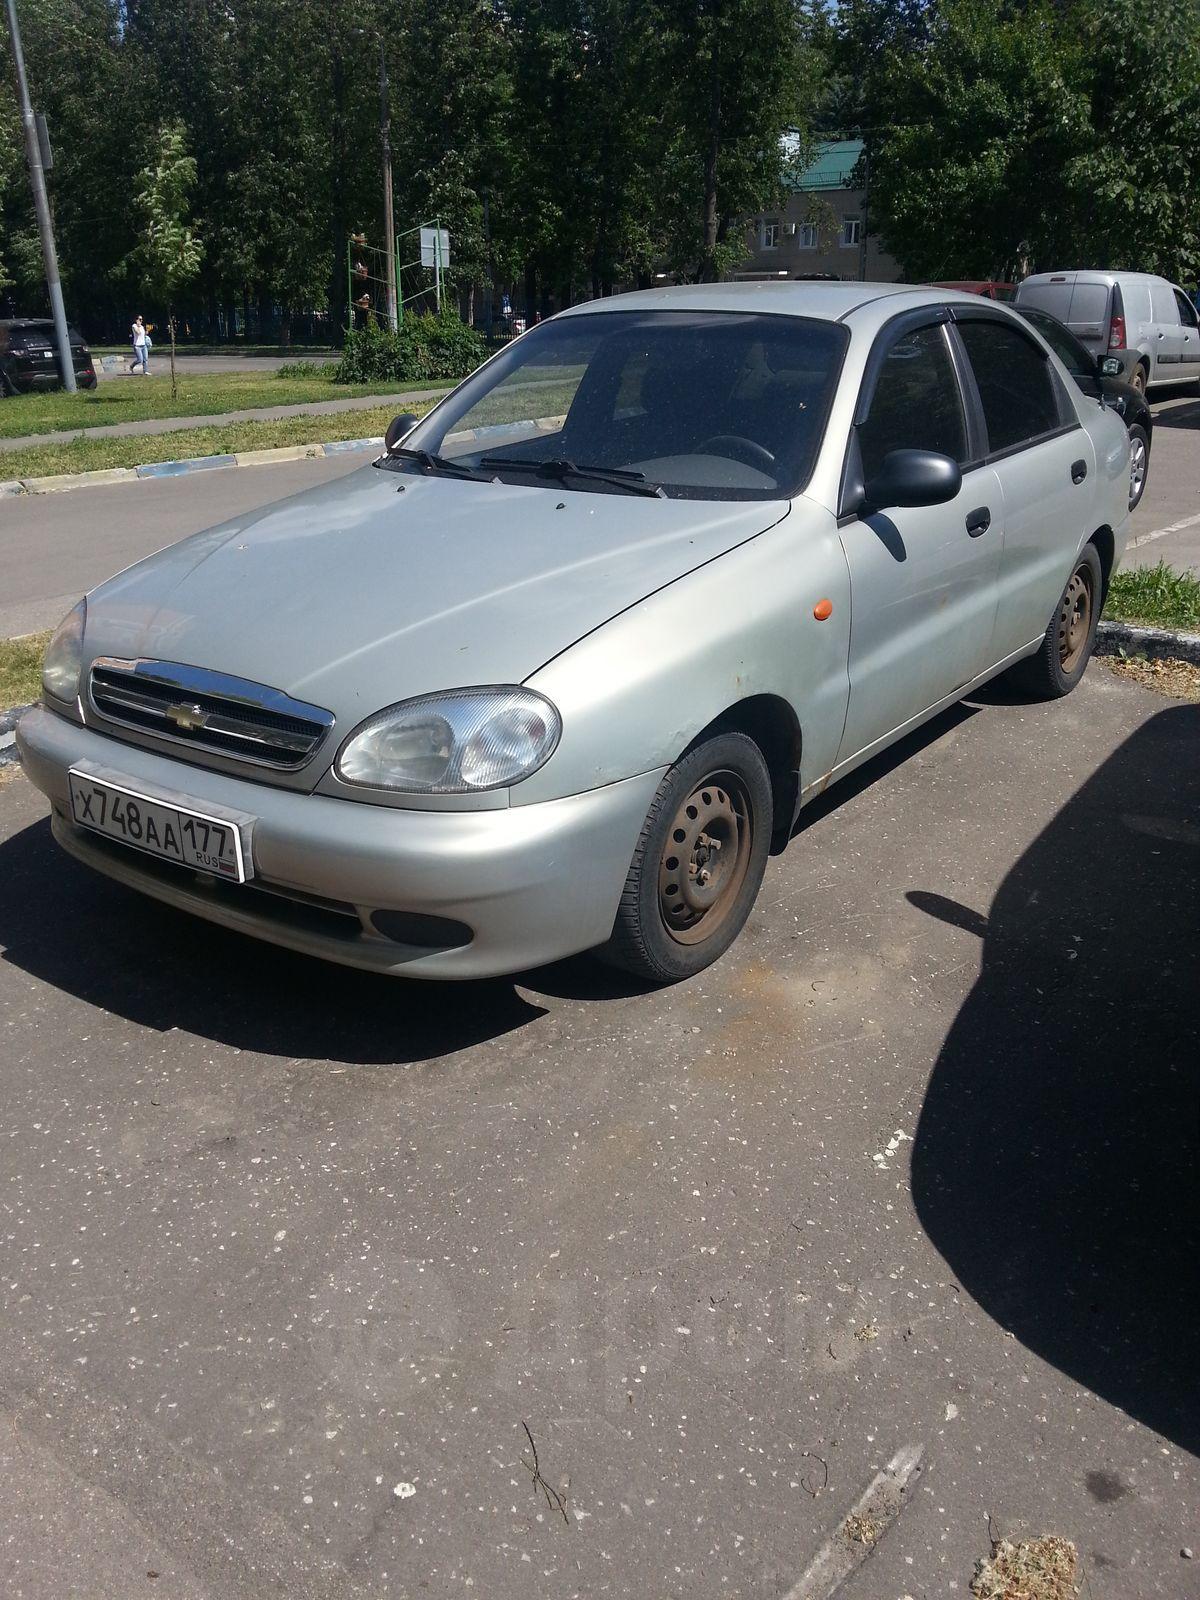 c3bf744442bf Chevrolet Lanos 2006 в Москве, Продаю chevrolet lanos 2006 г. в, бу ...